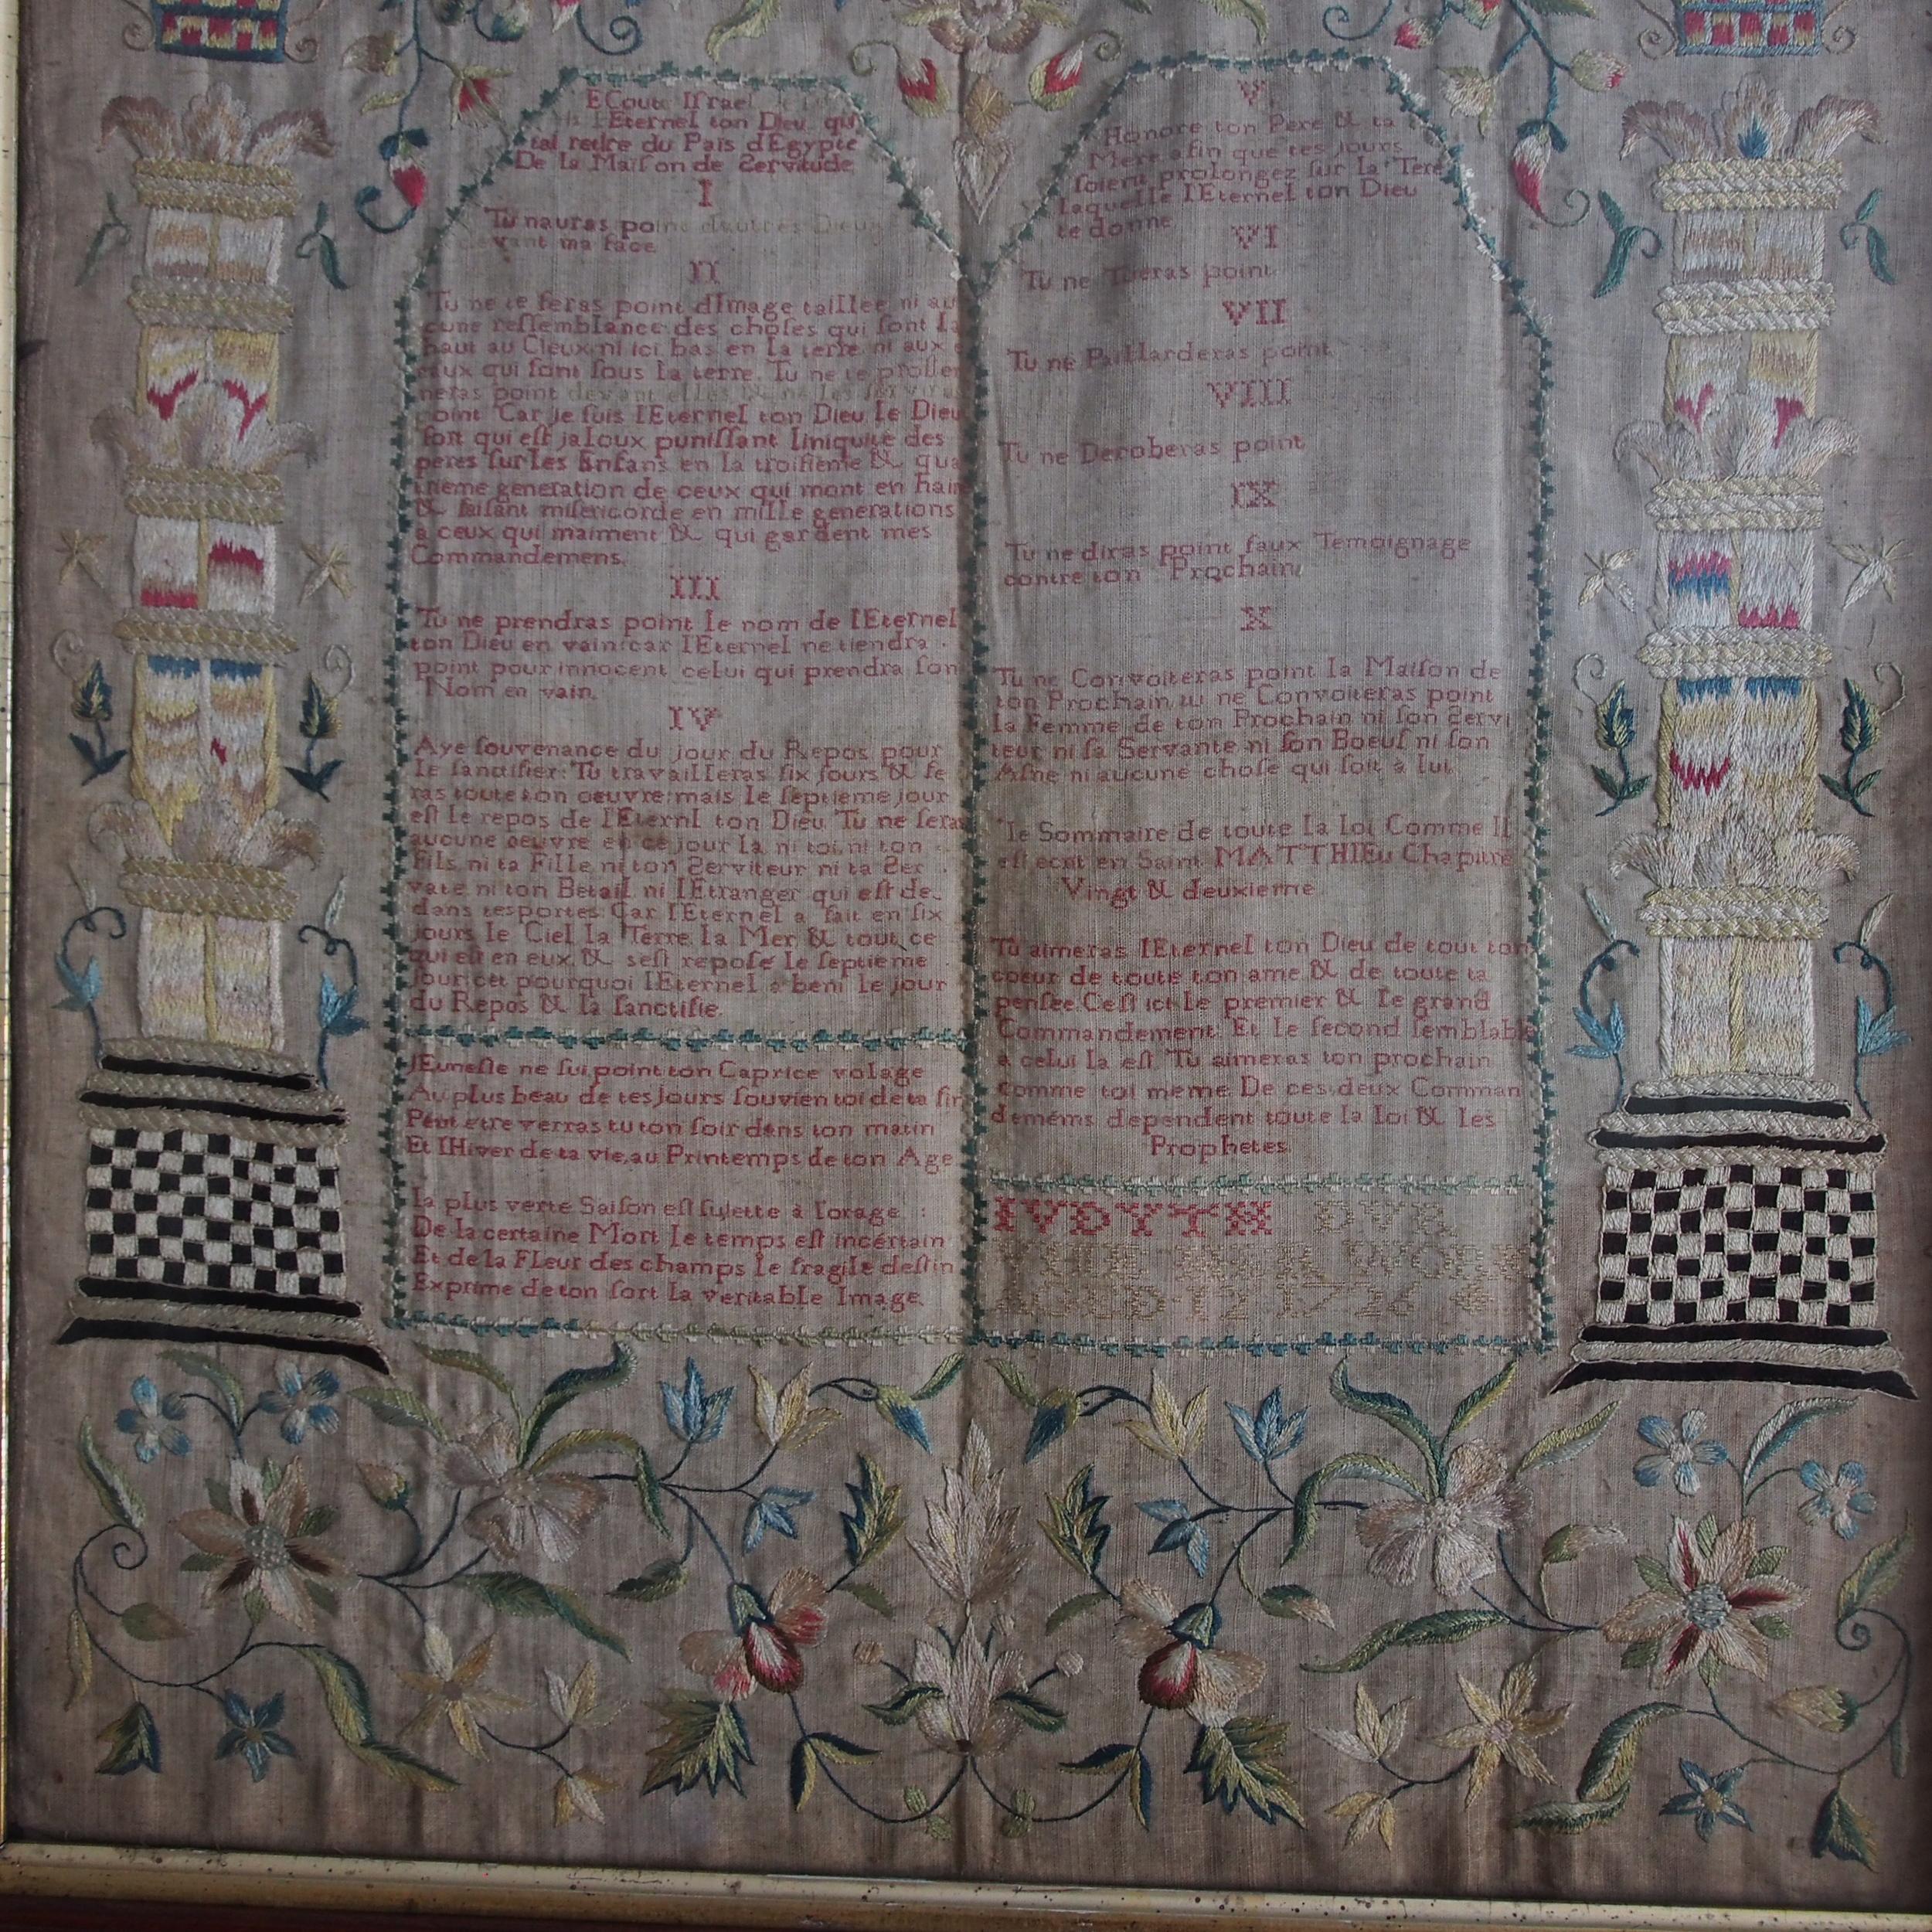 Embroidery of Ten Commandments